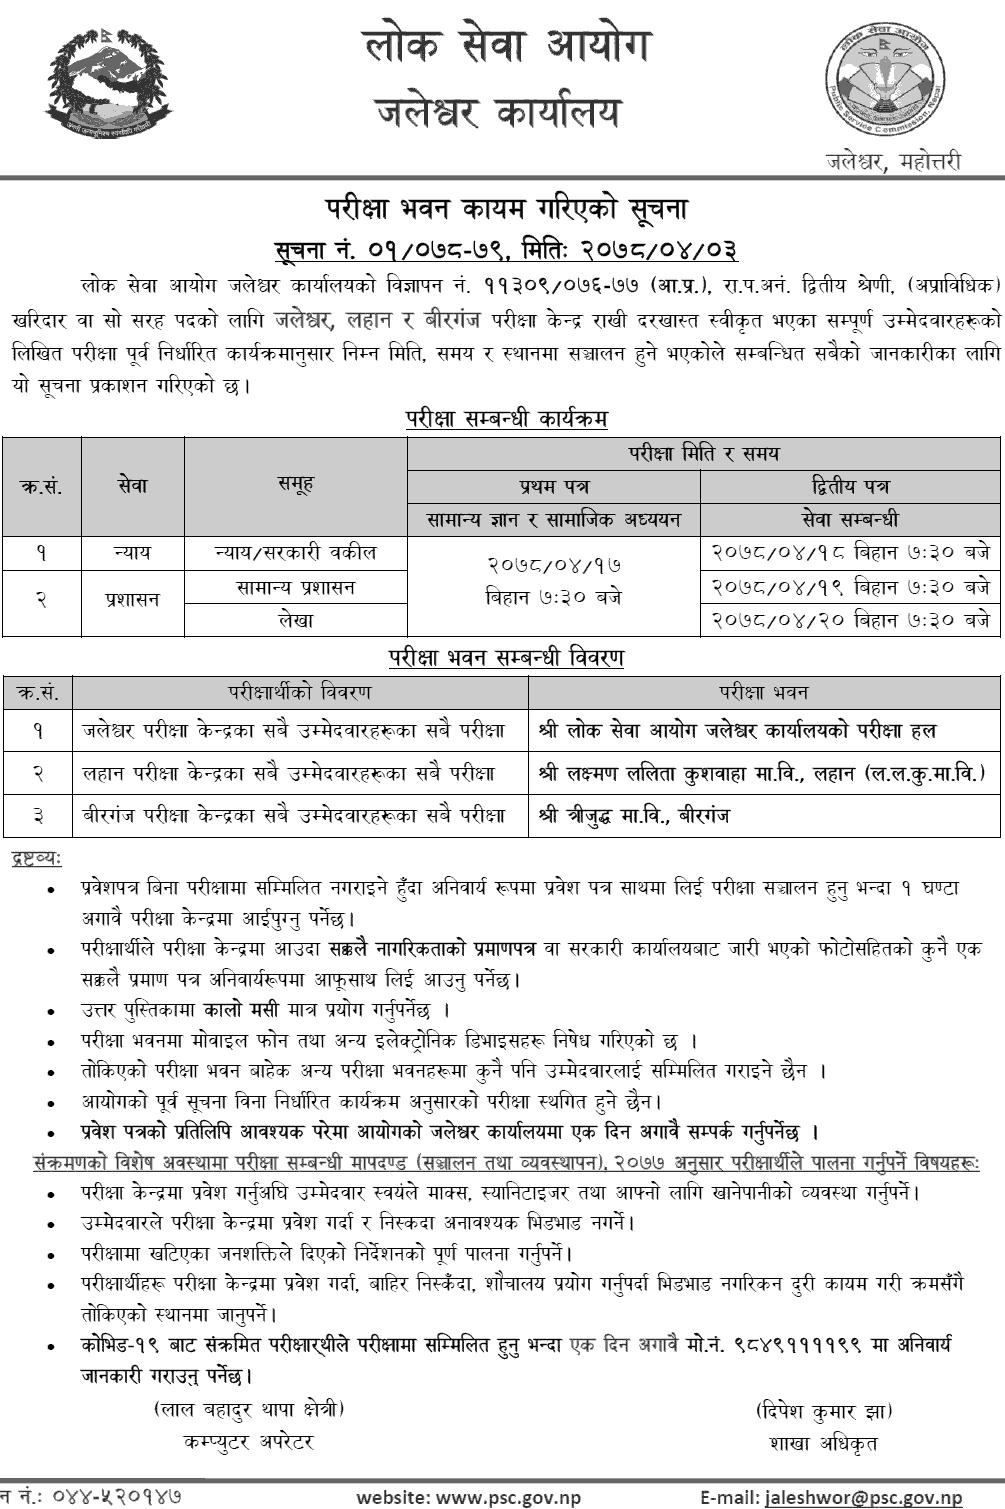 10) Lok Sewa Aayog Jaleshwor, Birgunj and Lahan (Kharidar Second Phase Written Exam Center)